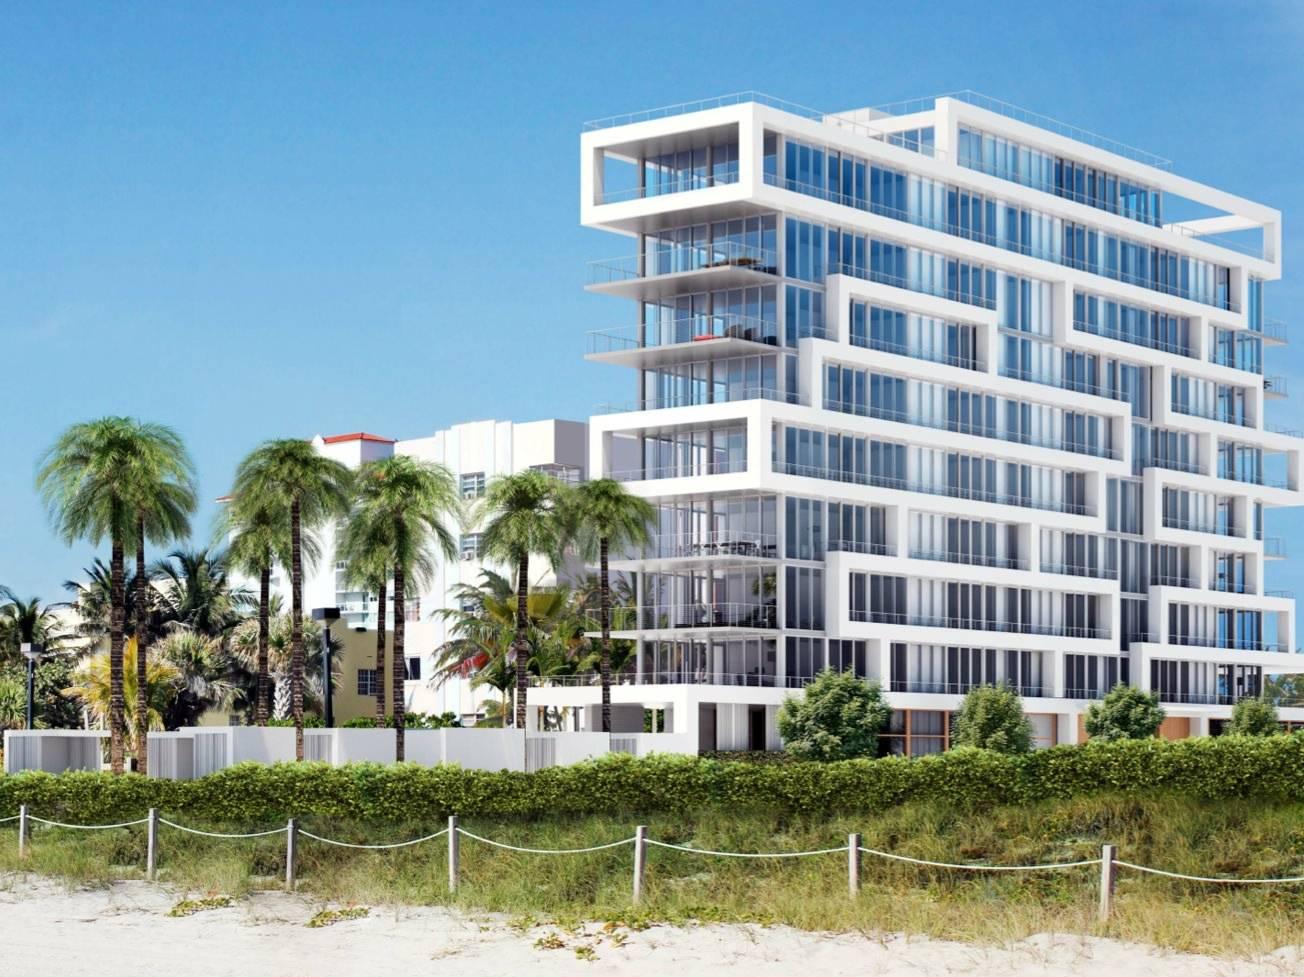 Wealthy Brazilian Purchase Miami Beach Penthouse